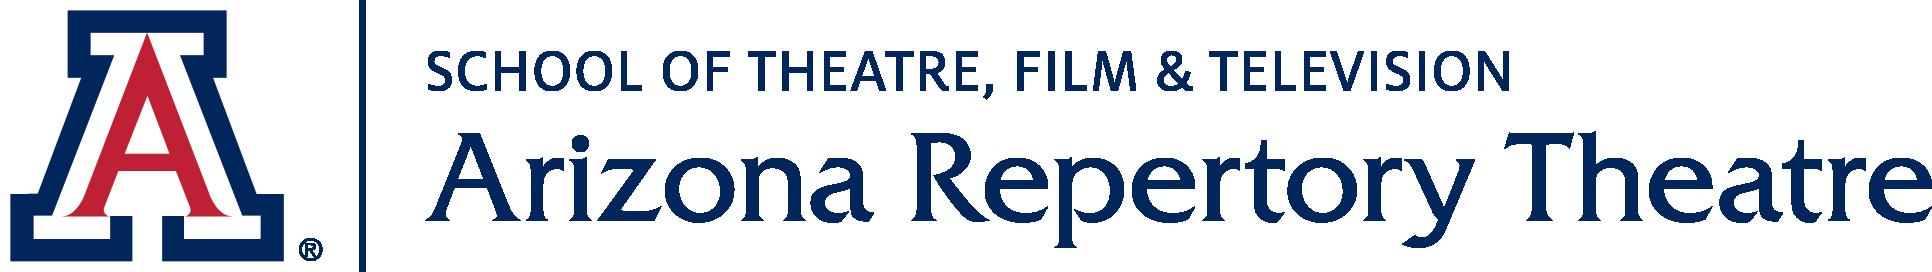 Arizona Repertory Theatre Logo